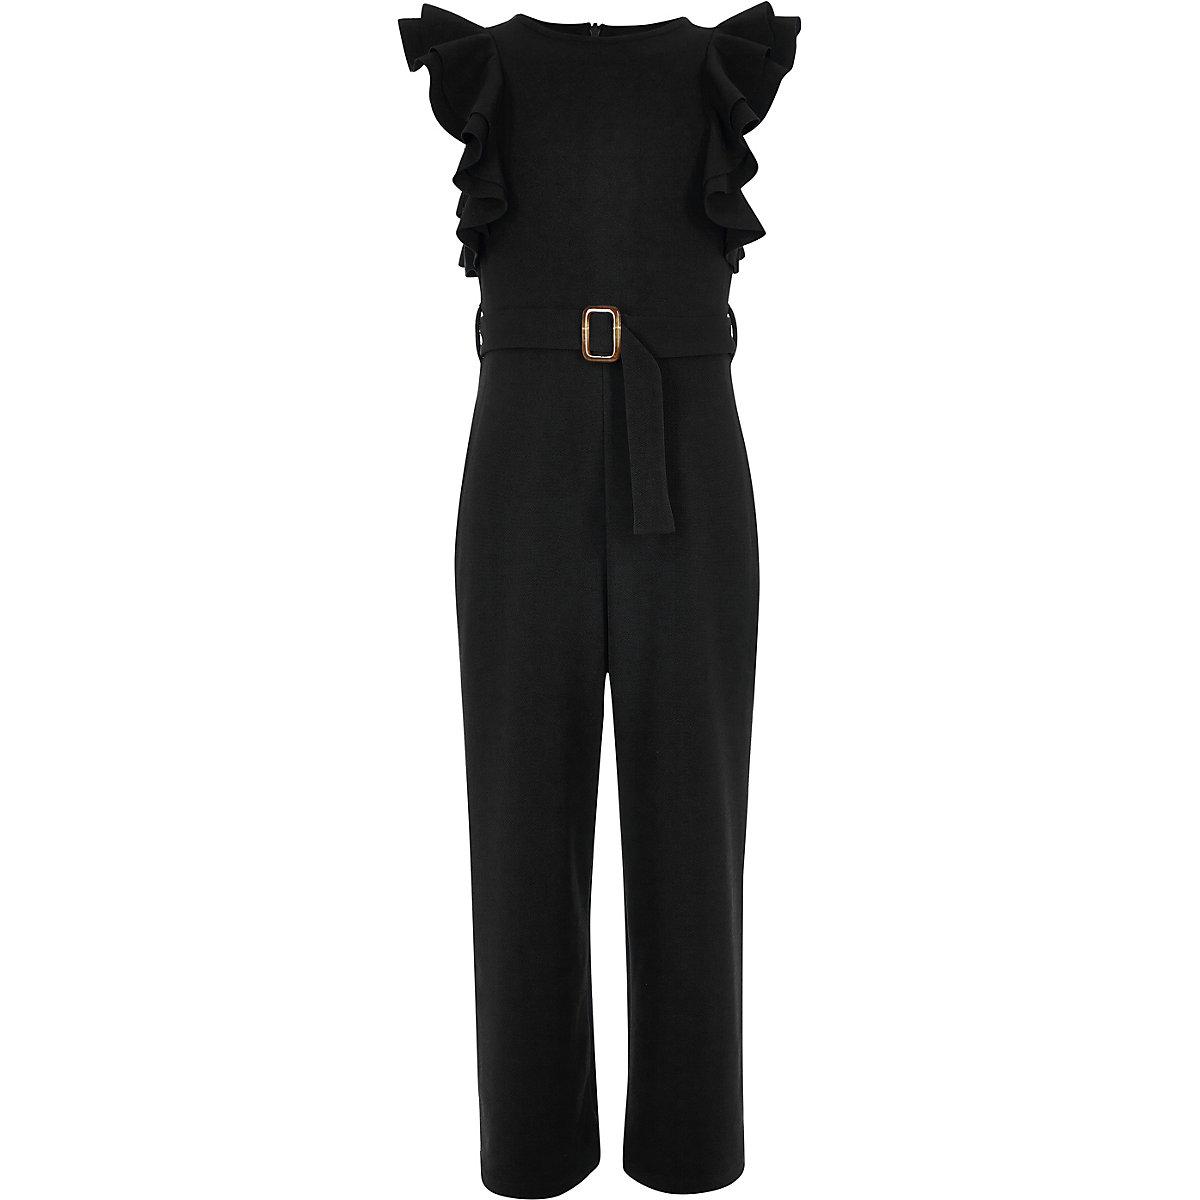 Girls black ruffle belted jumpsuit